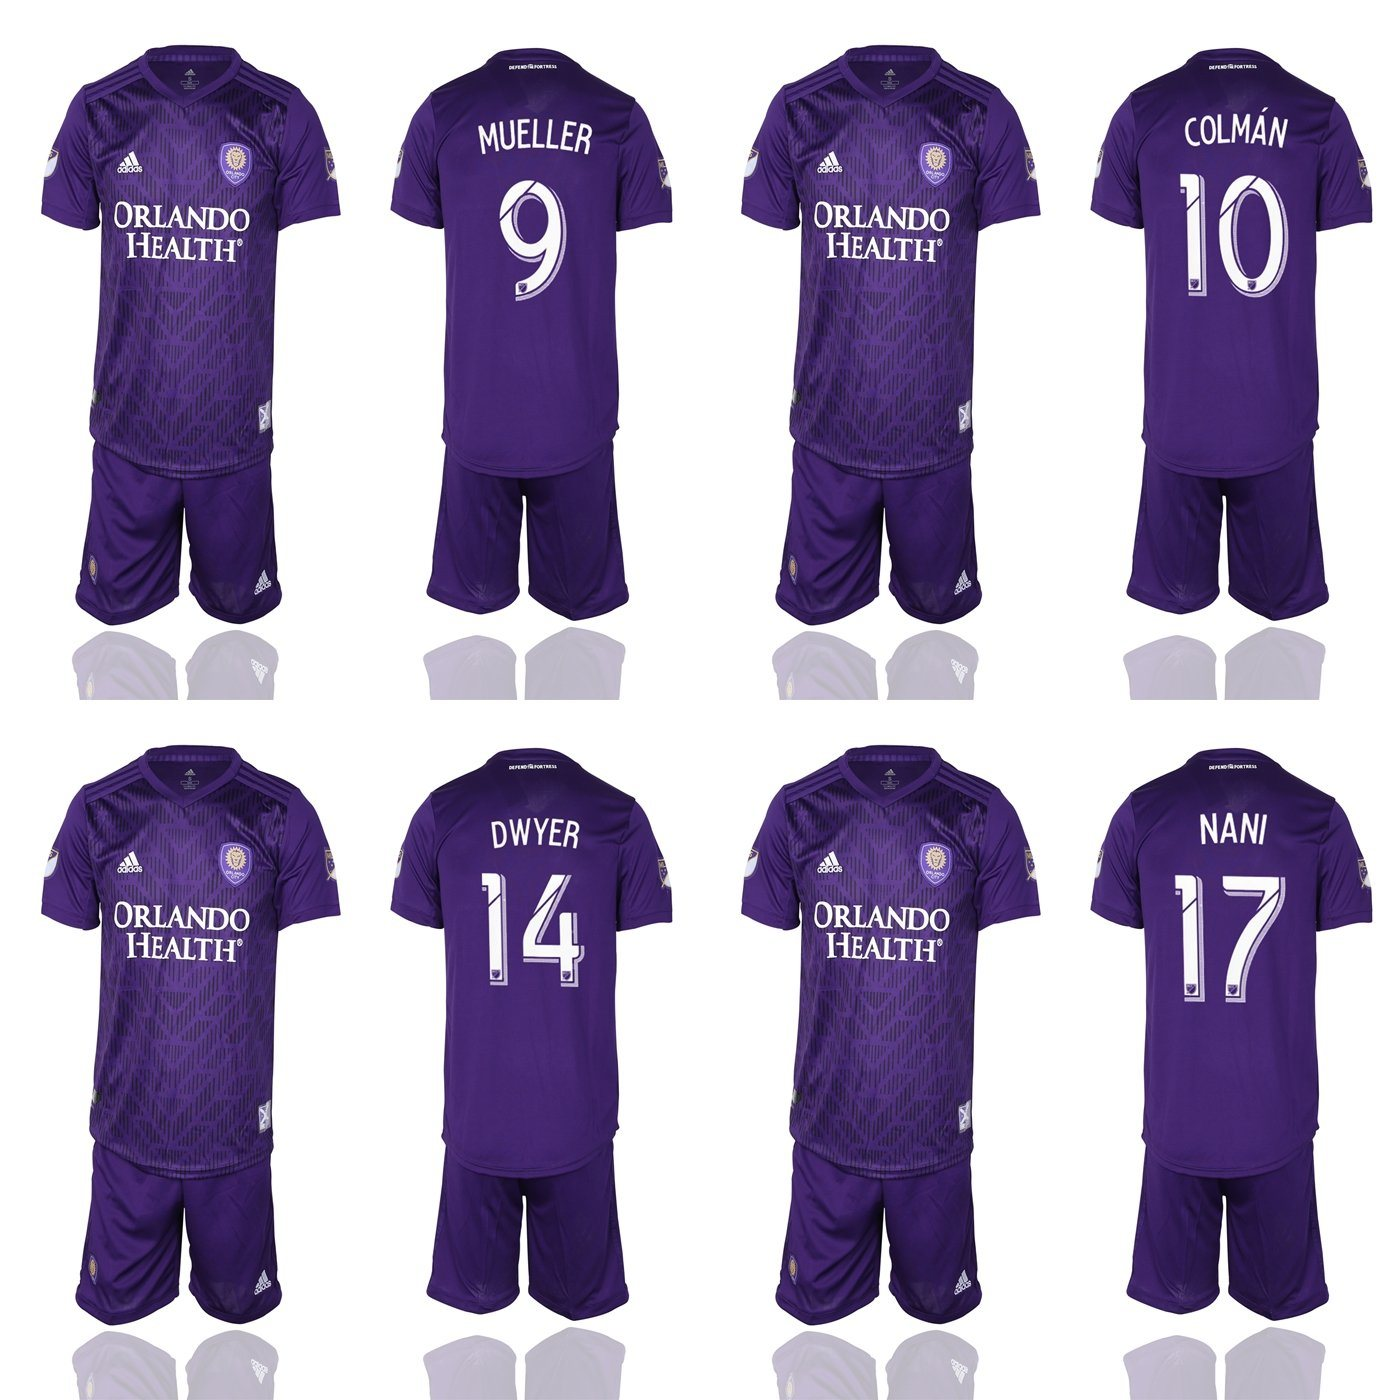 premium selection c142b 26e64 [Hot Item] Orlando City Mueller Colman Dwyer Nani Kljestan Patino Soccer  Jerseys